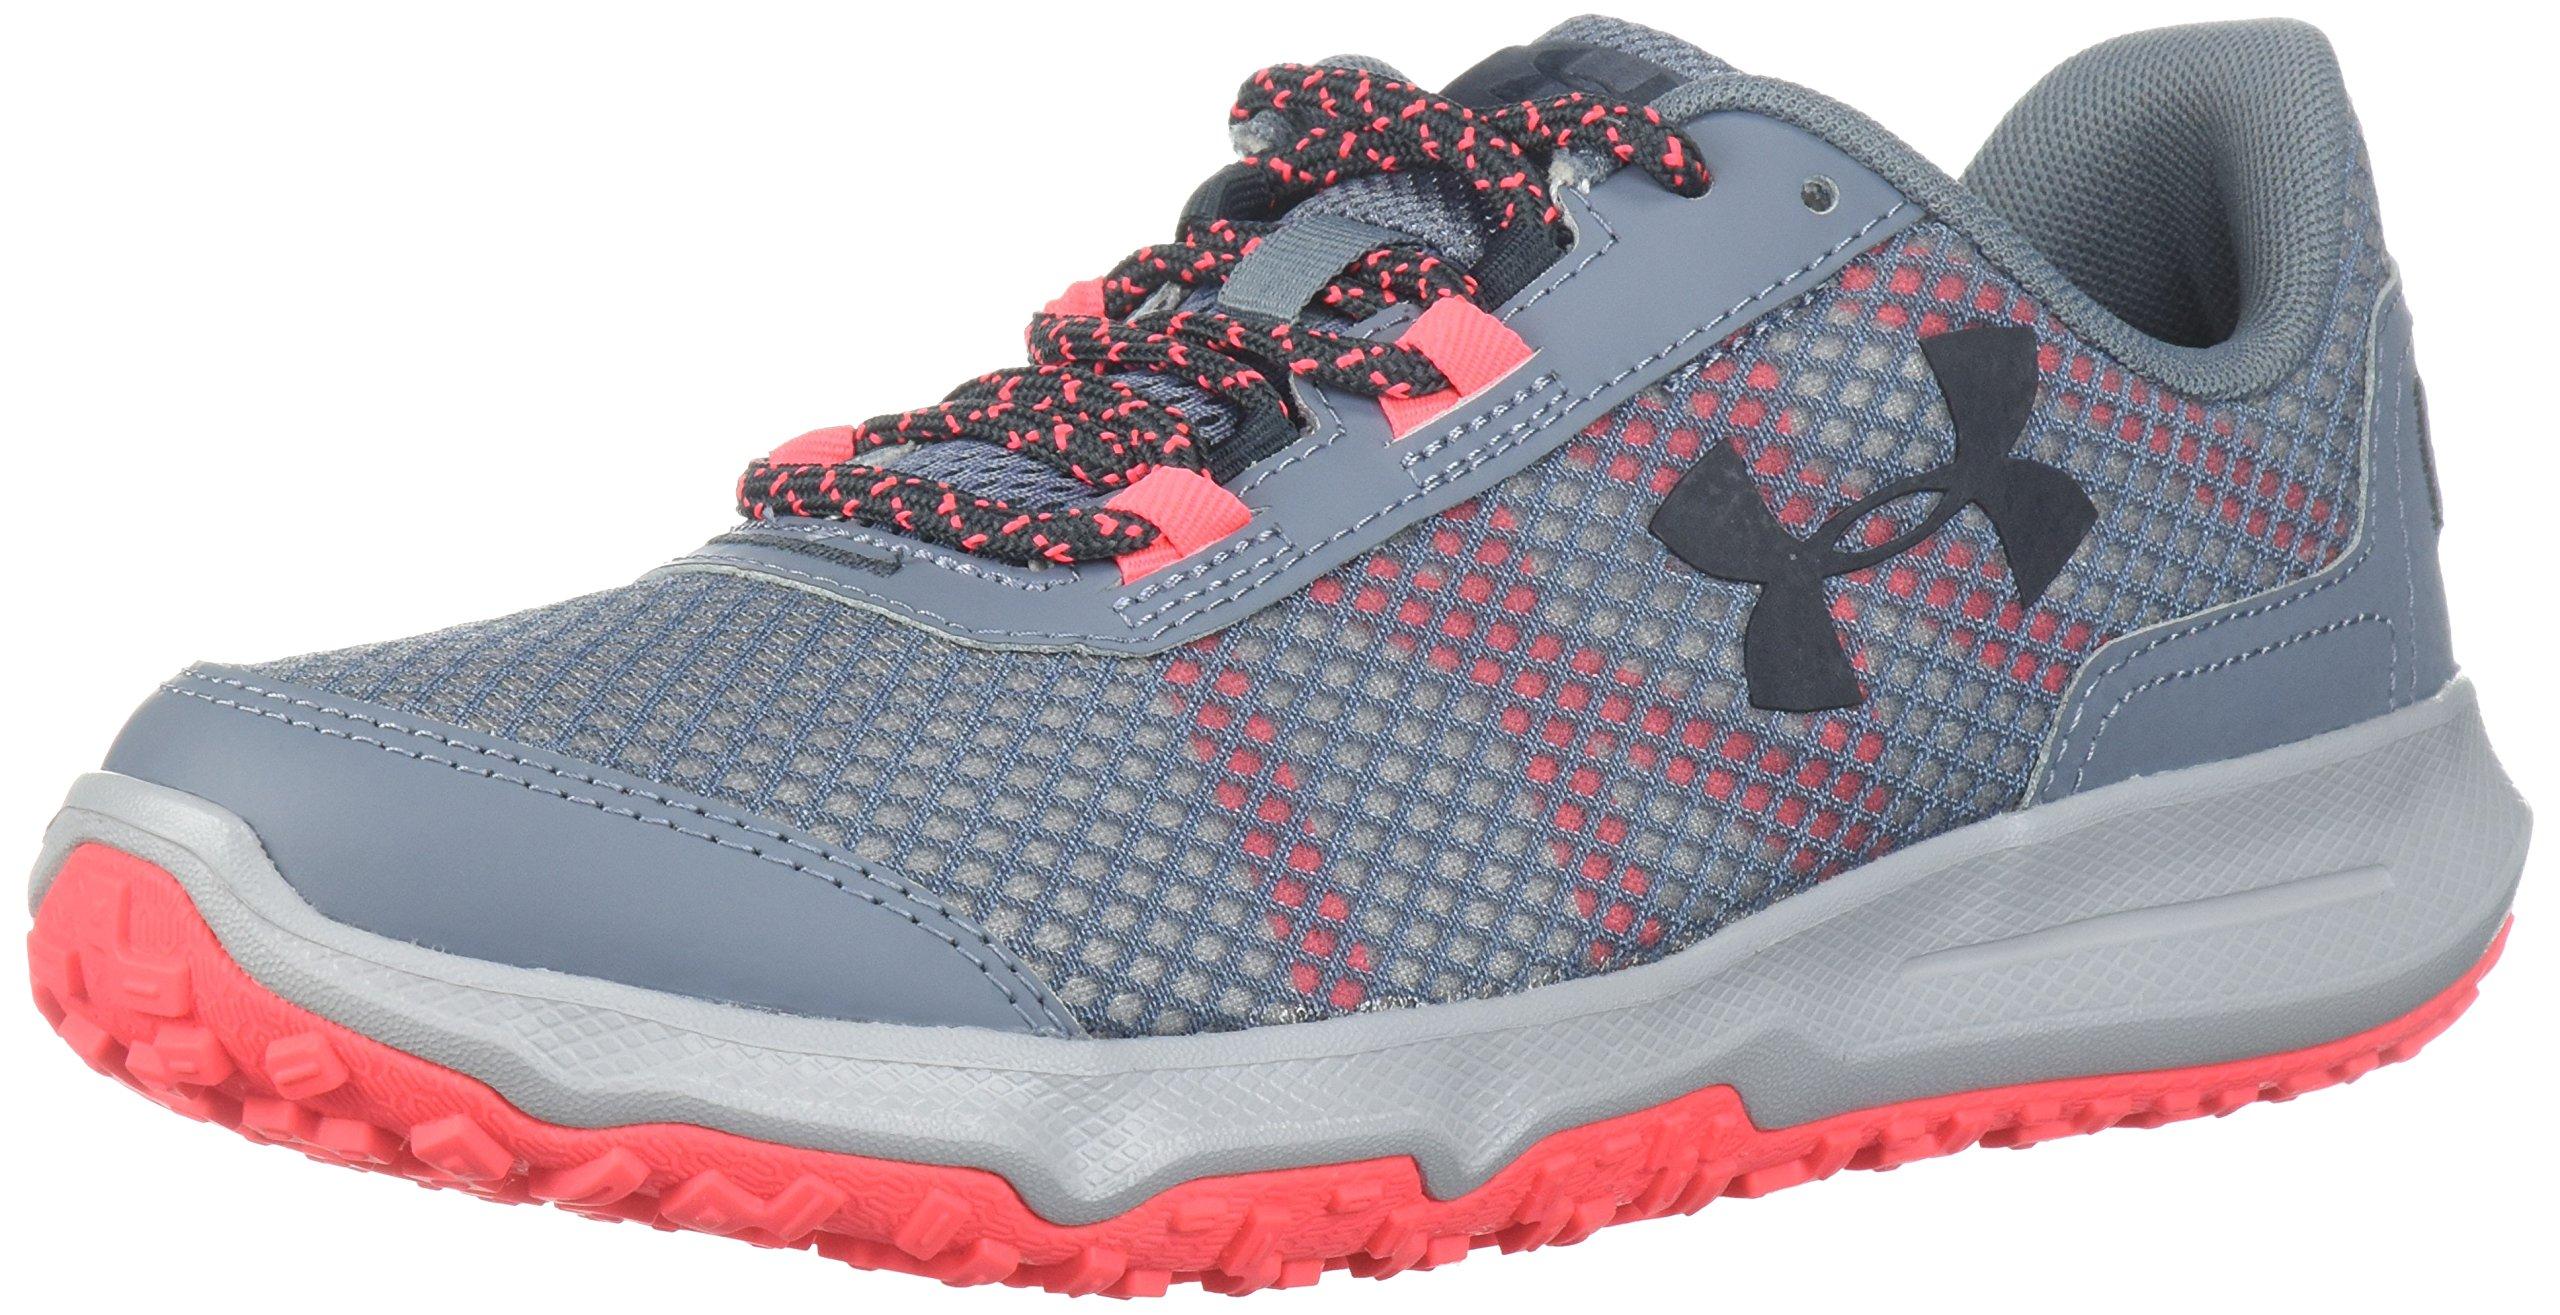 Galleon - Under Armour Women s Toccoa Running Shoe 0744cd5b3b0